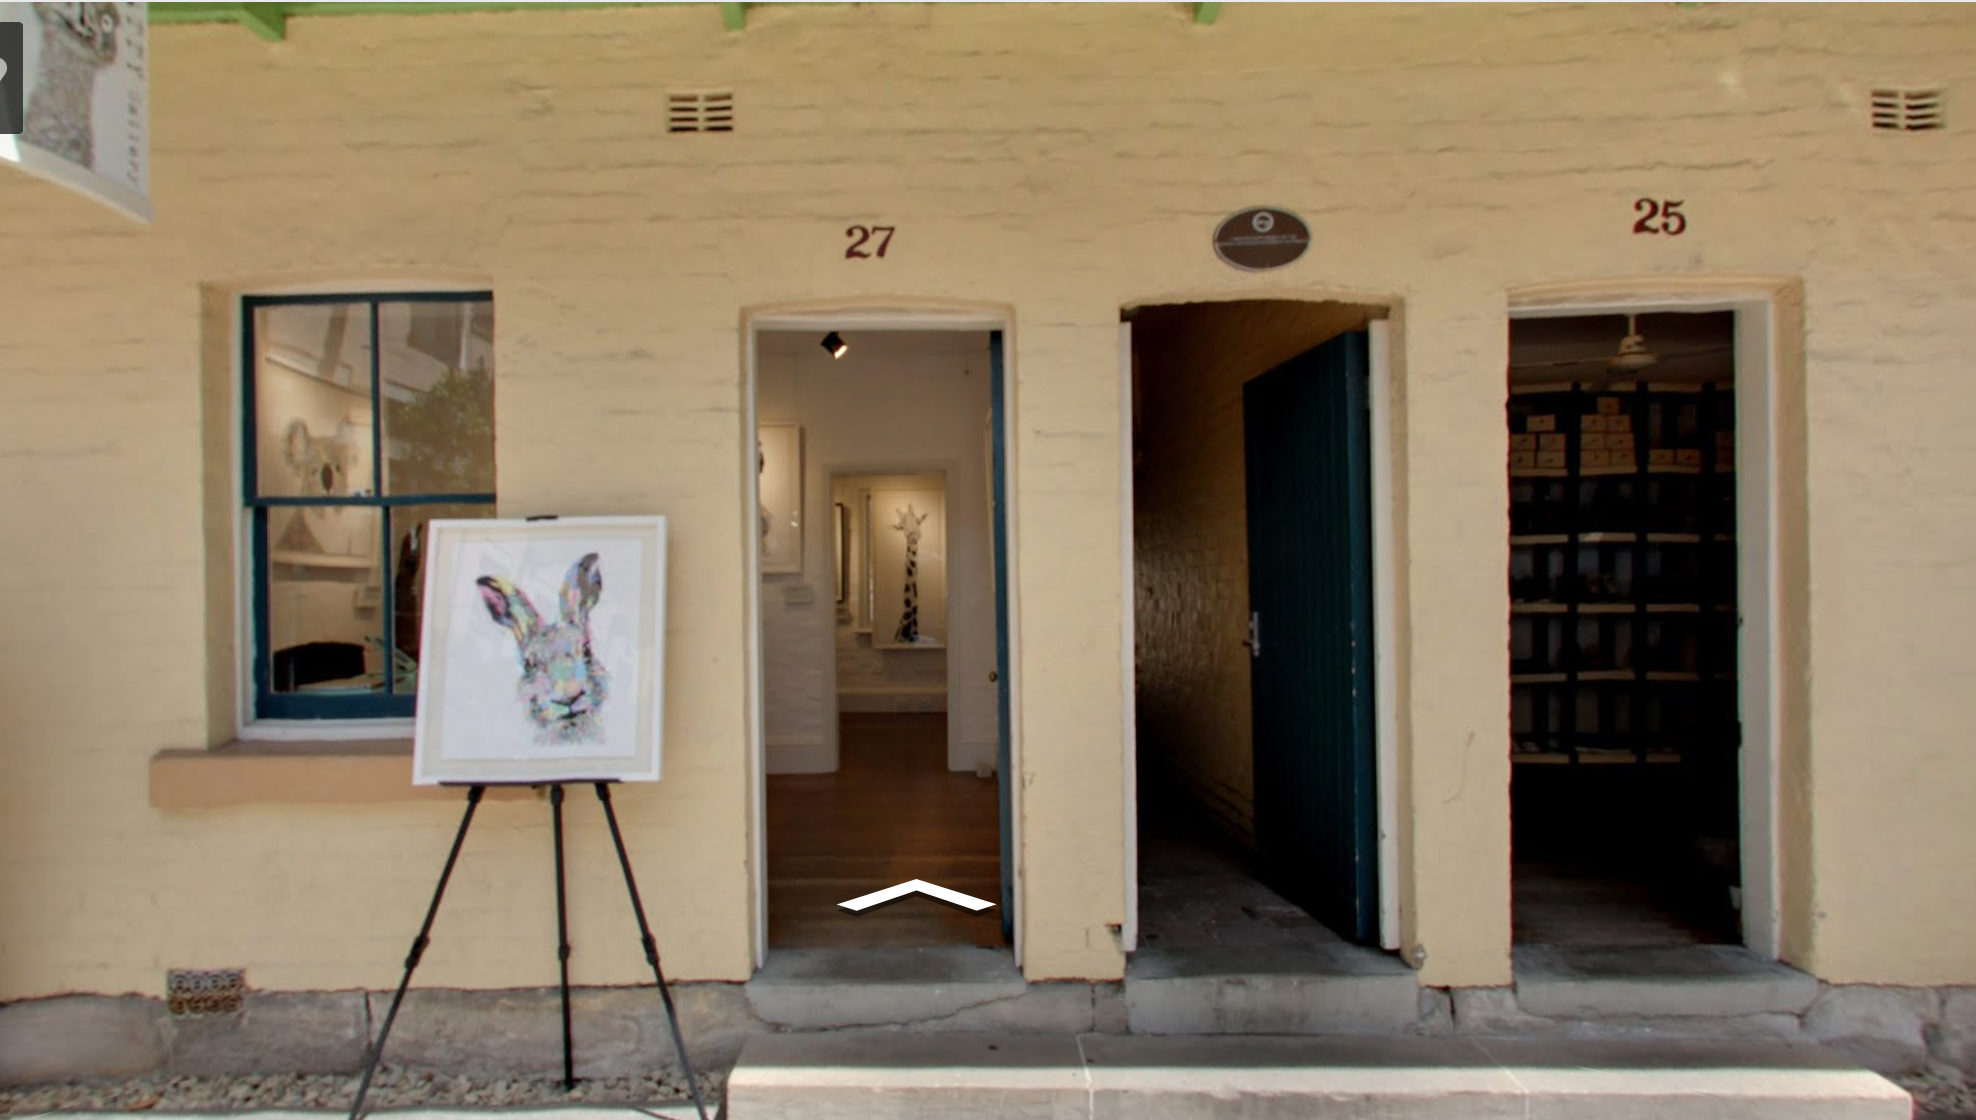 Atty Gallery in Sydney